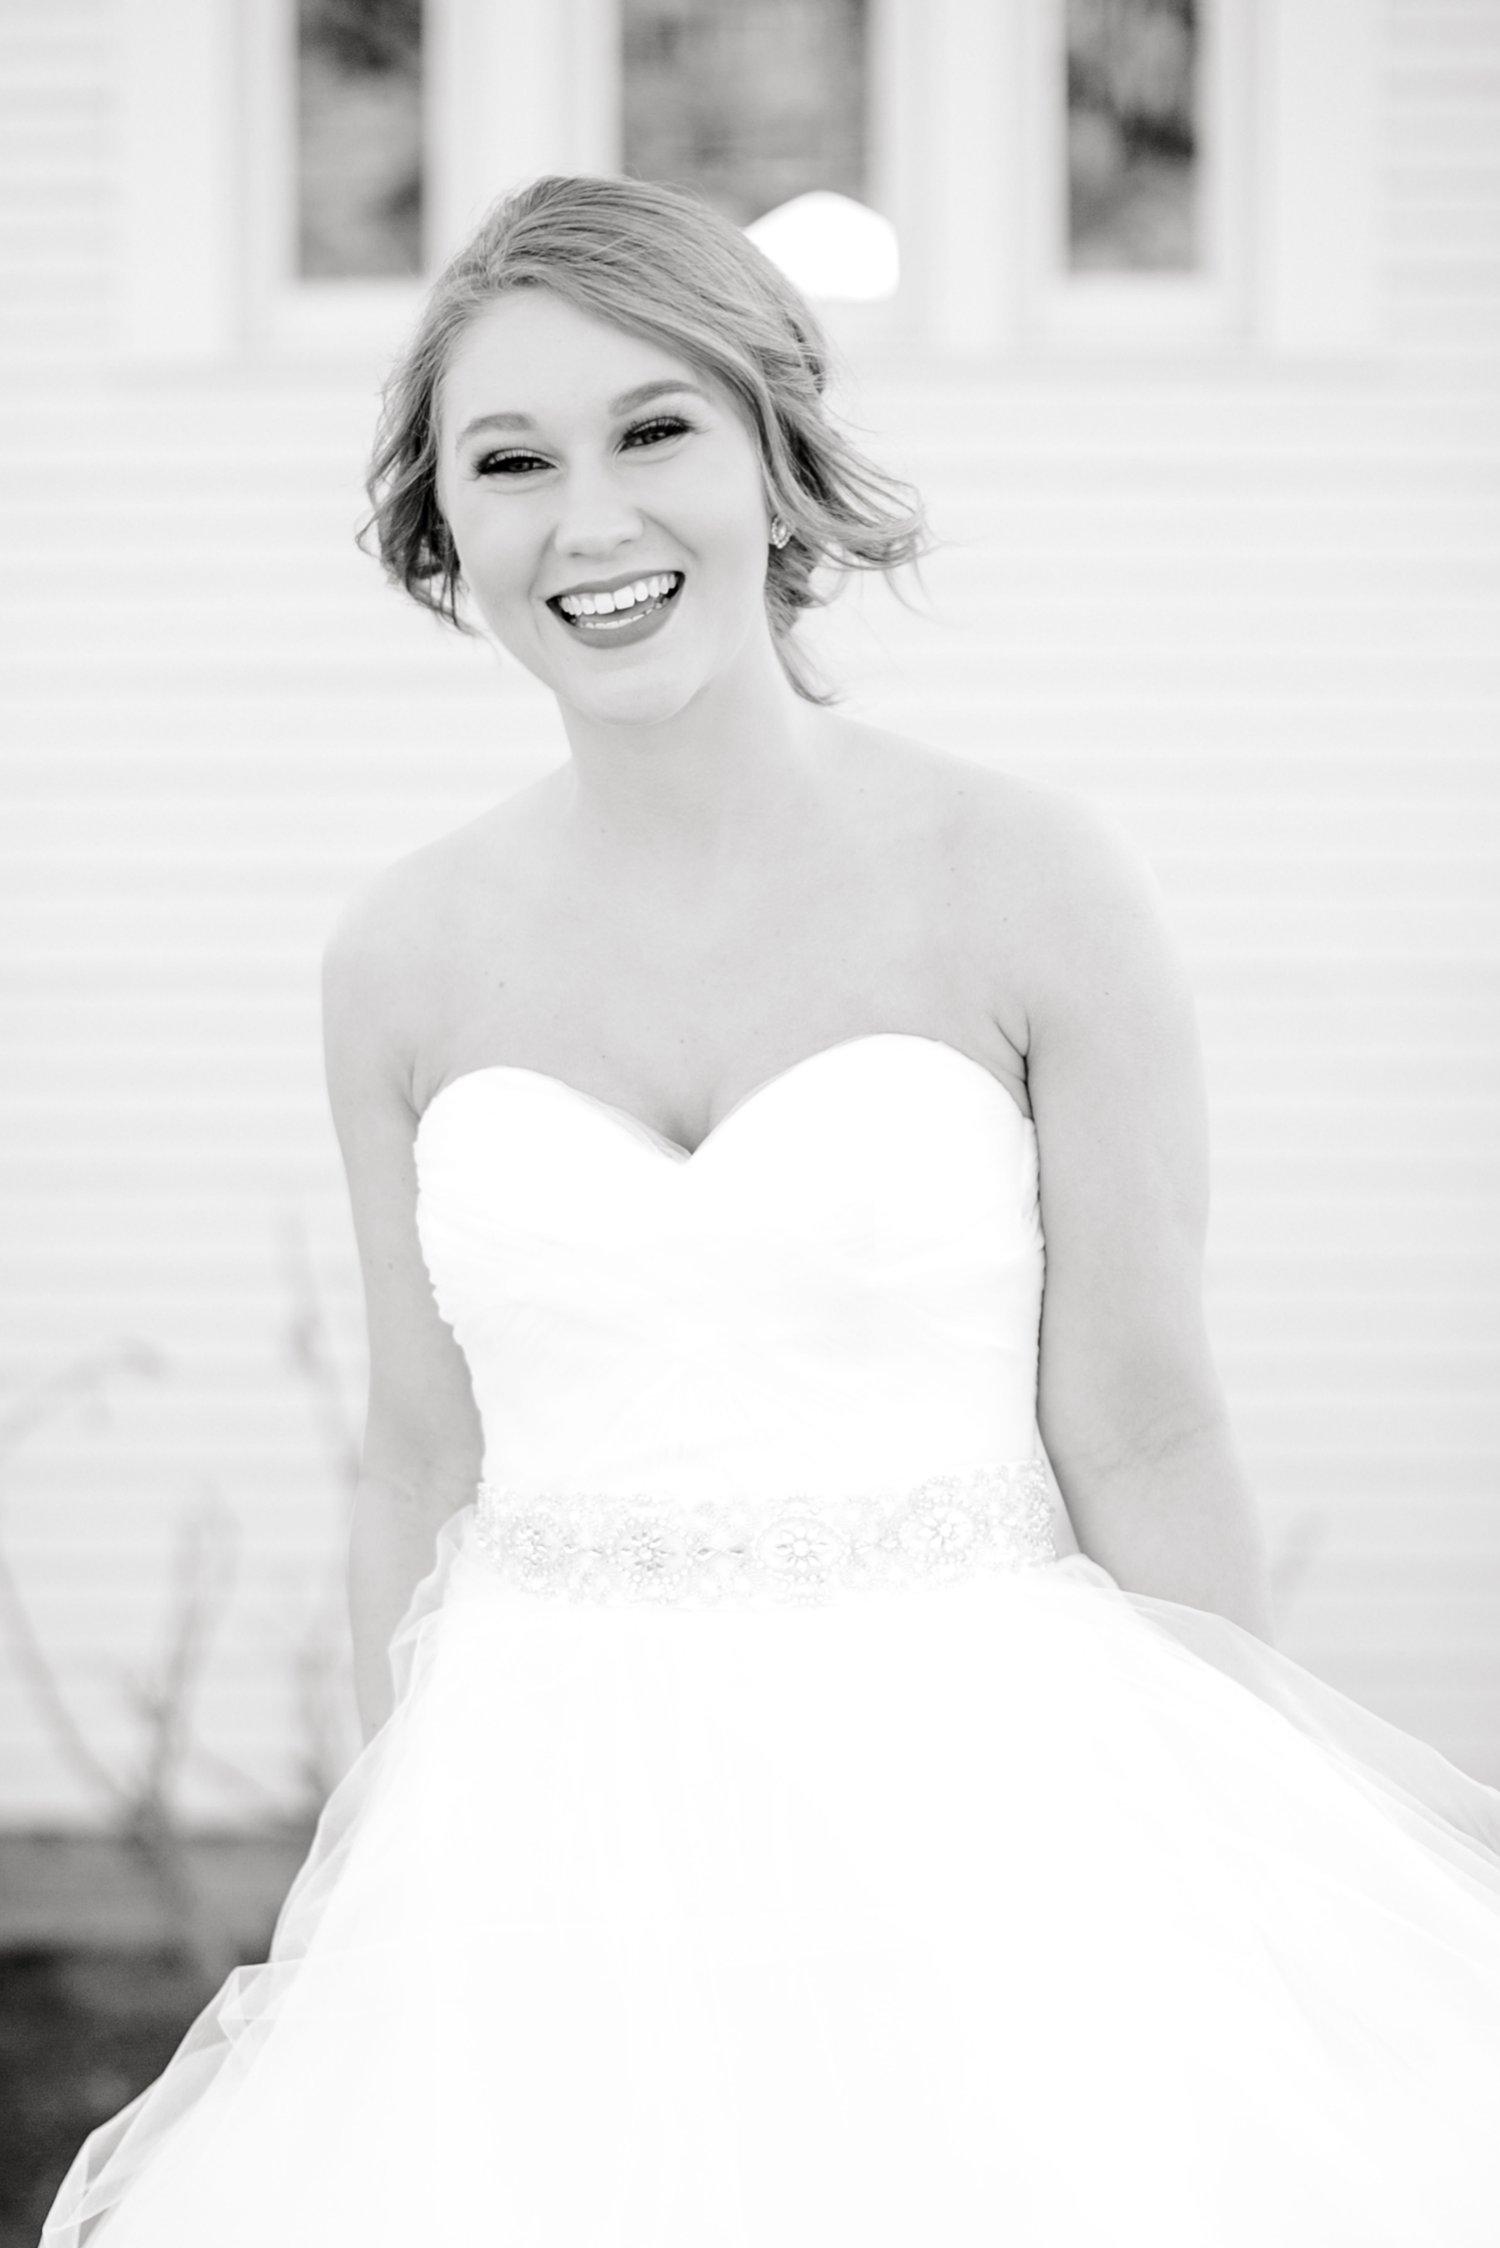 Kaila-cox-bridals-lubbock-photographer0005.jpg